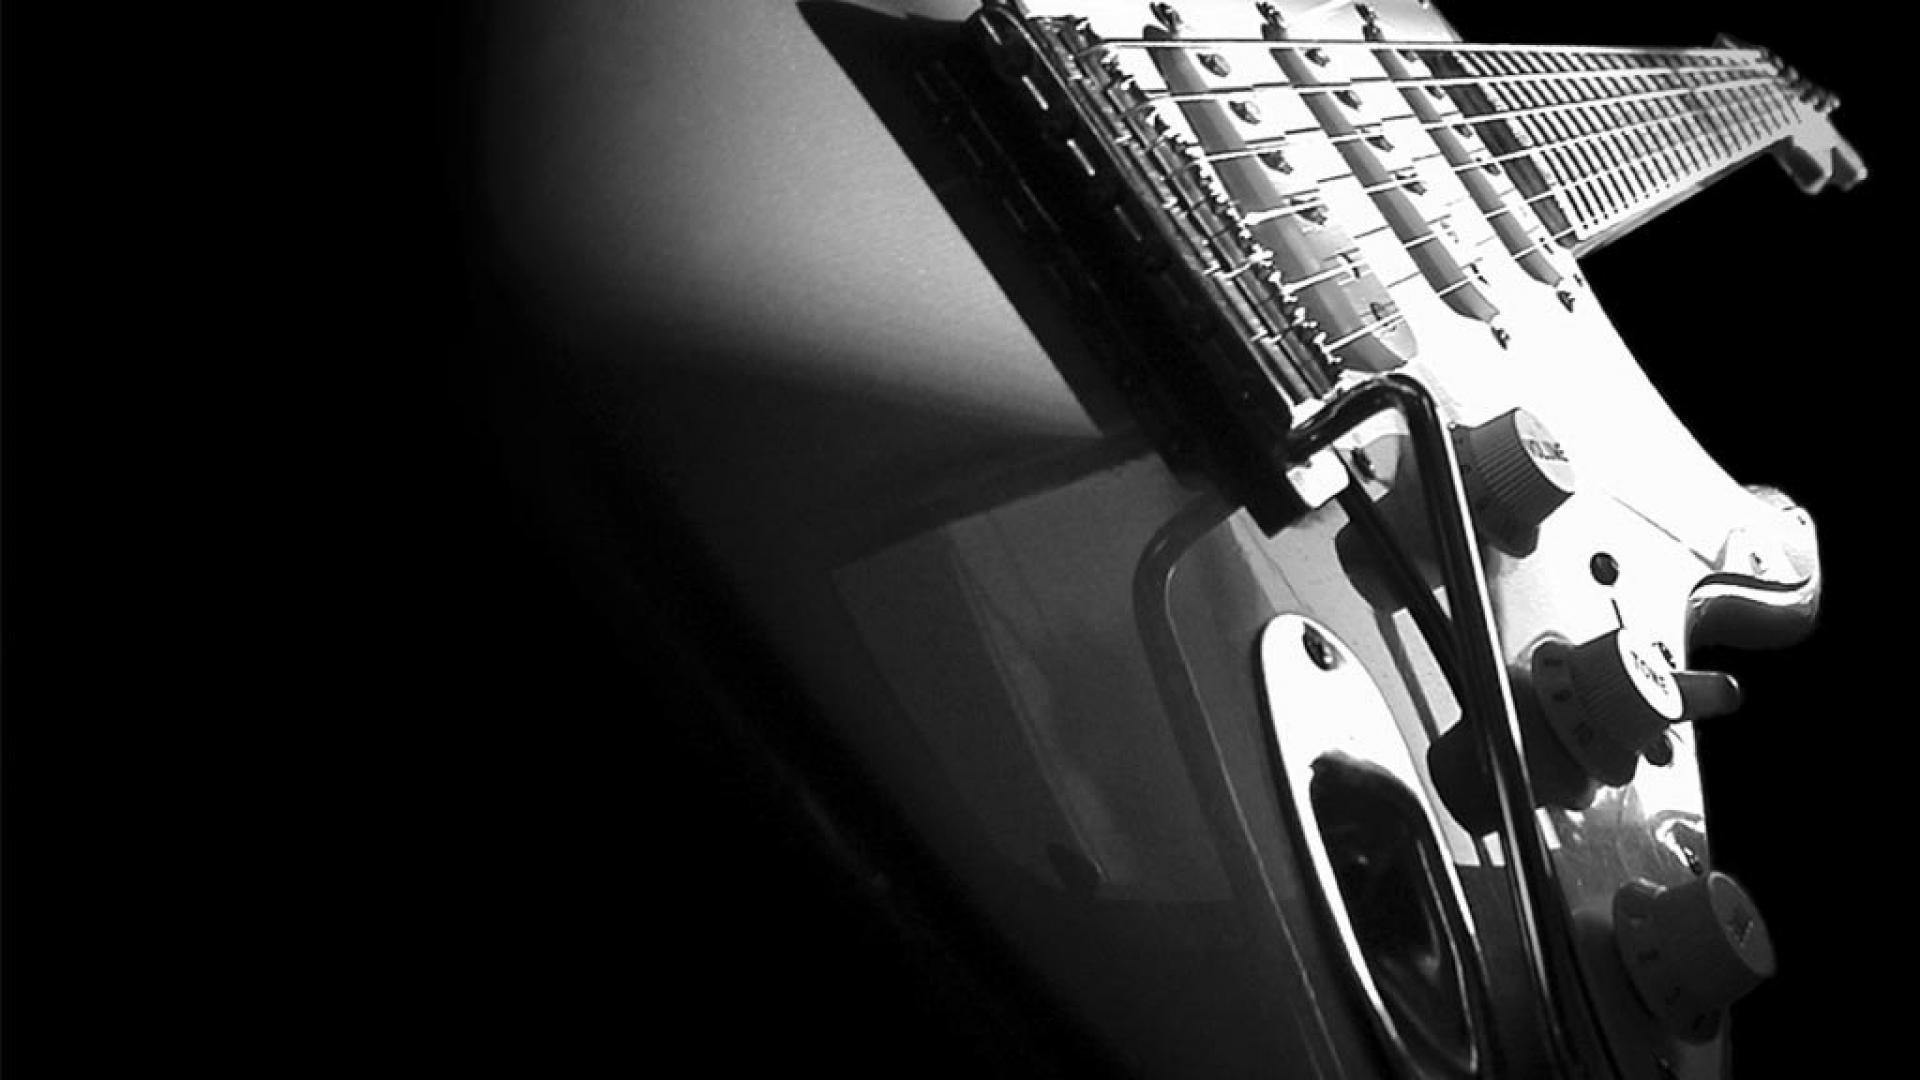 My wallpapers music wallpaper guitar fender HQ WALLPAPER 1920x1080